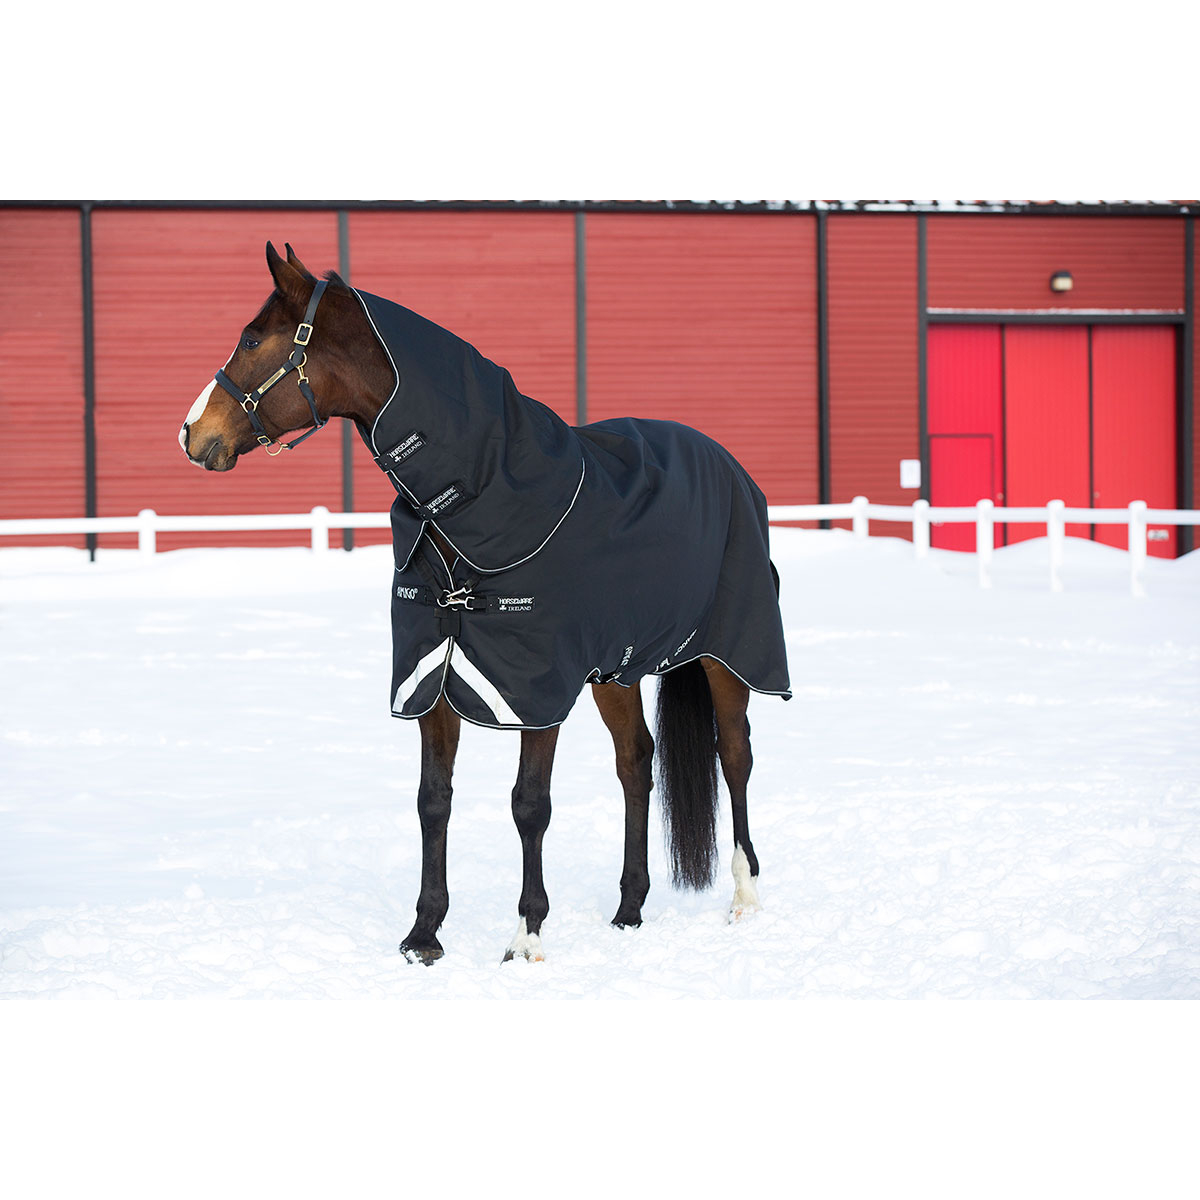 Horseware amigo bravo 12 plus uteg ngst cke heavy 400g for Portent g3 sw 12